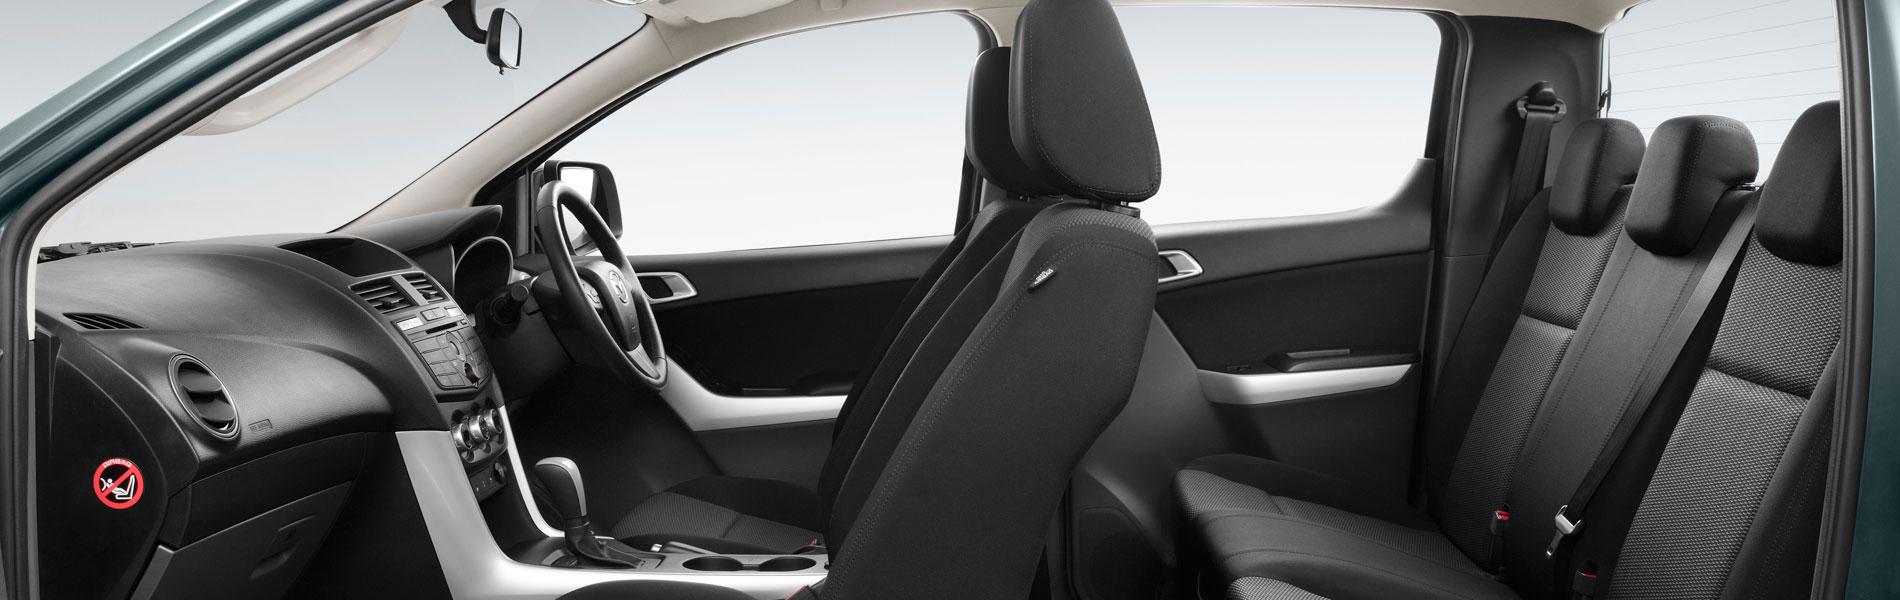 Mazda BT-50 Dual Cab Image 3